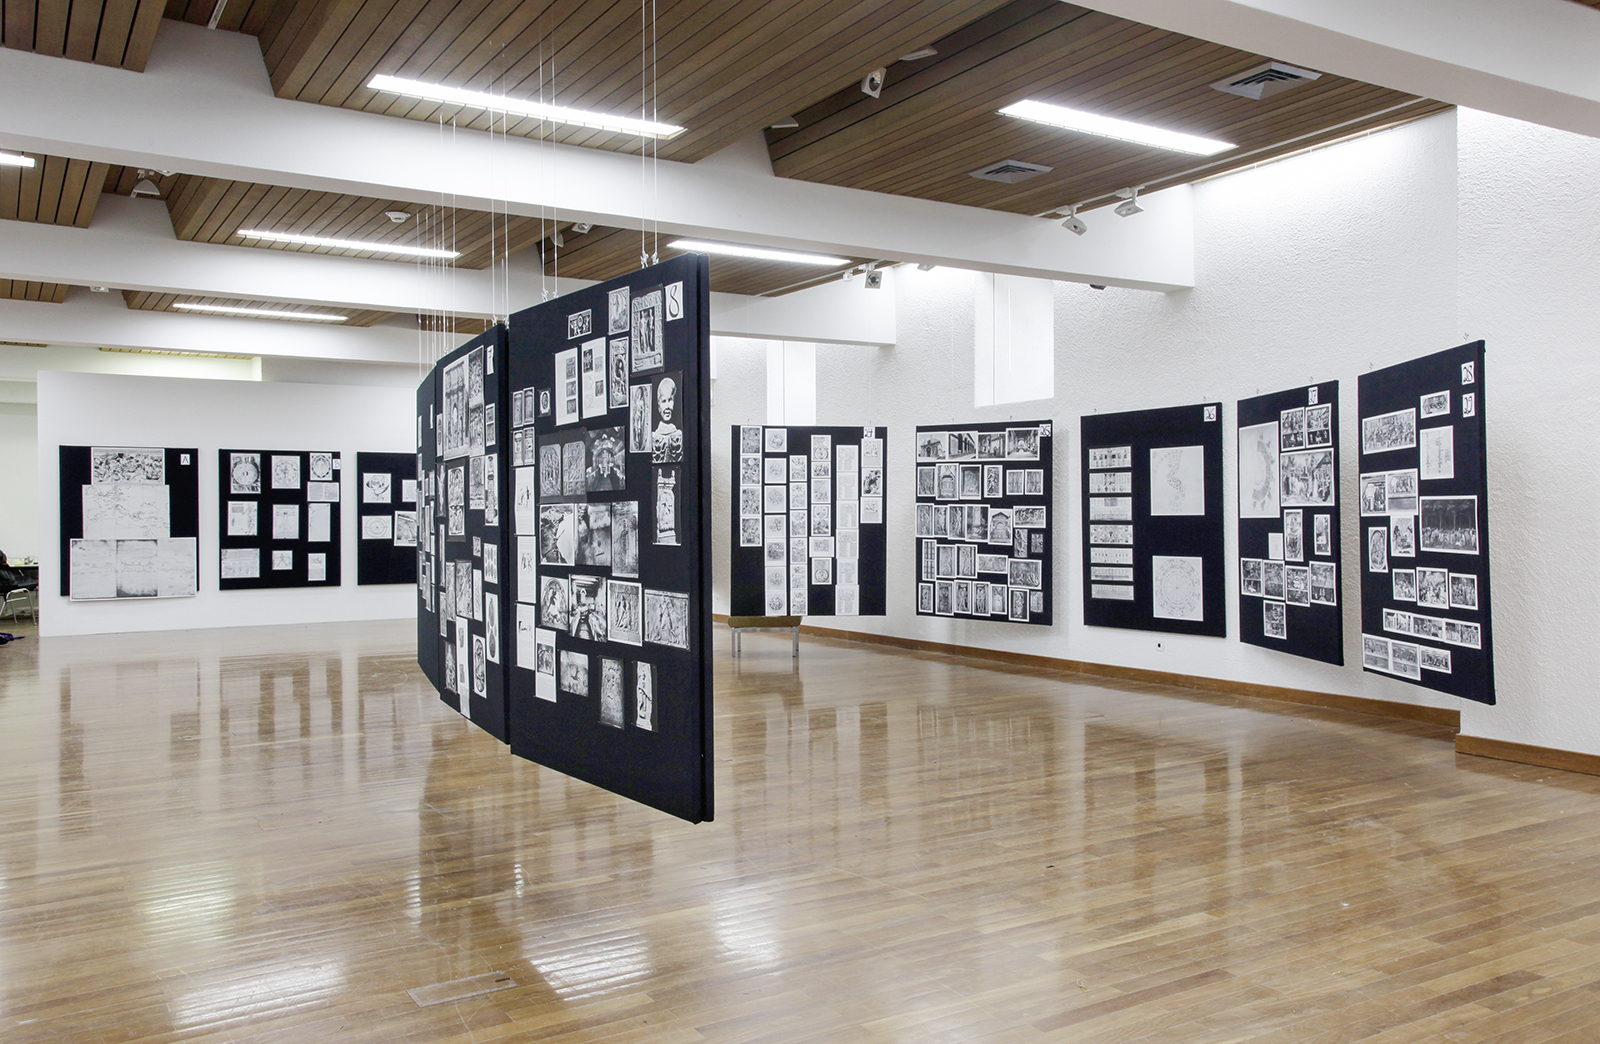 Die rekonstruierten Bildtafeln des Kulturhistorikers Aby Warburg im Kulturraum St. Gallen, 2013. Foto: Jiri Makovec